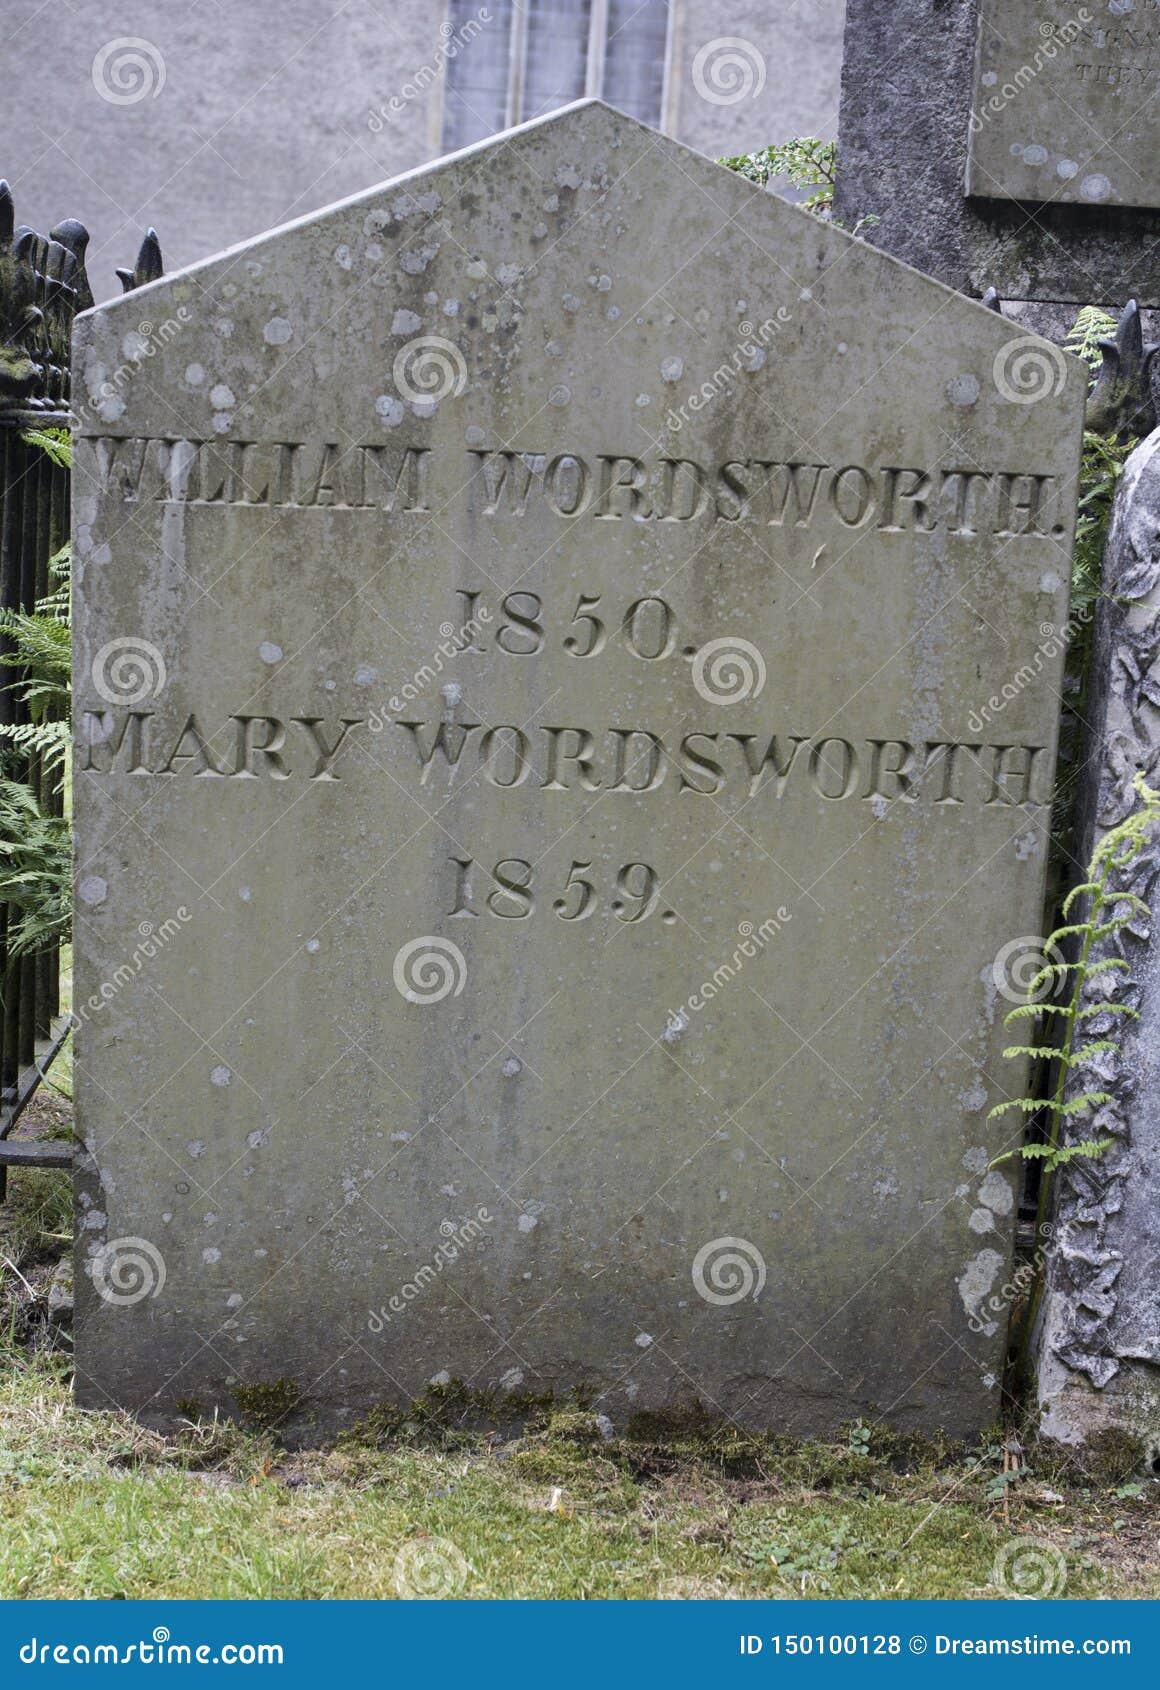 William Wordsworth - St Oswald`s Church, Grasmere